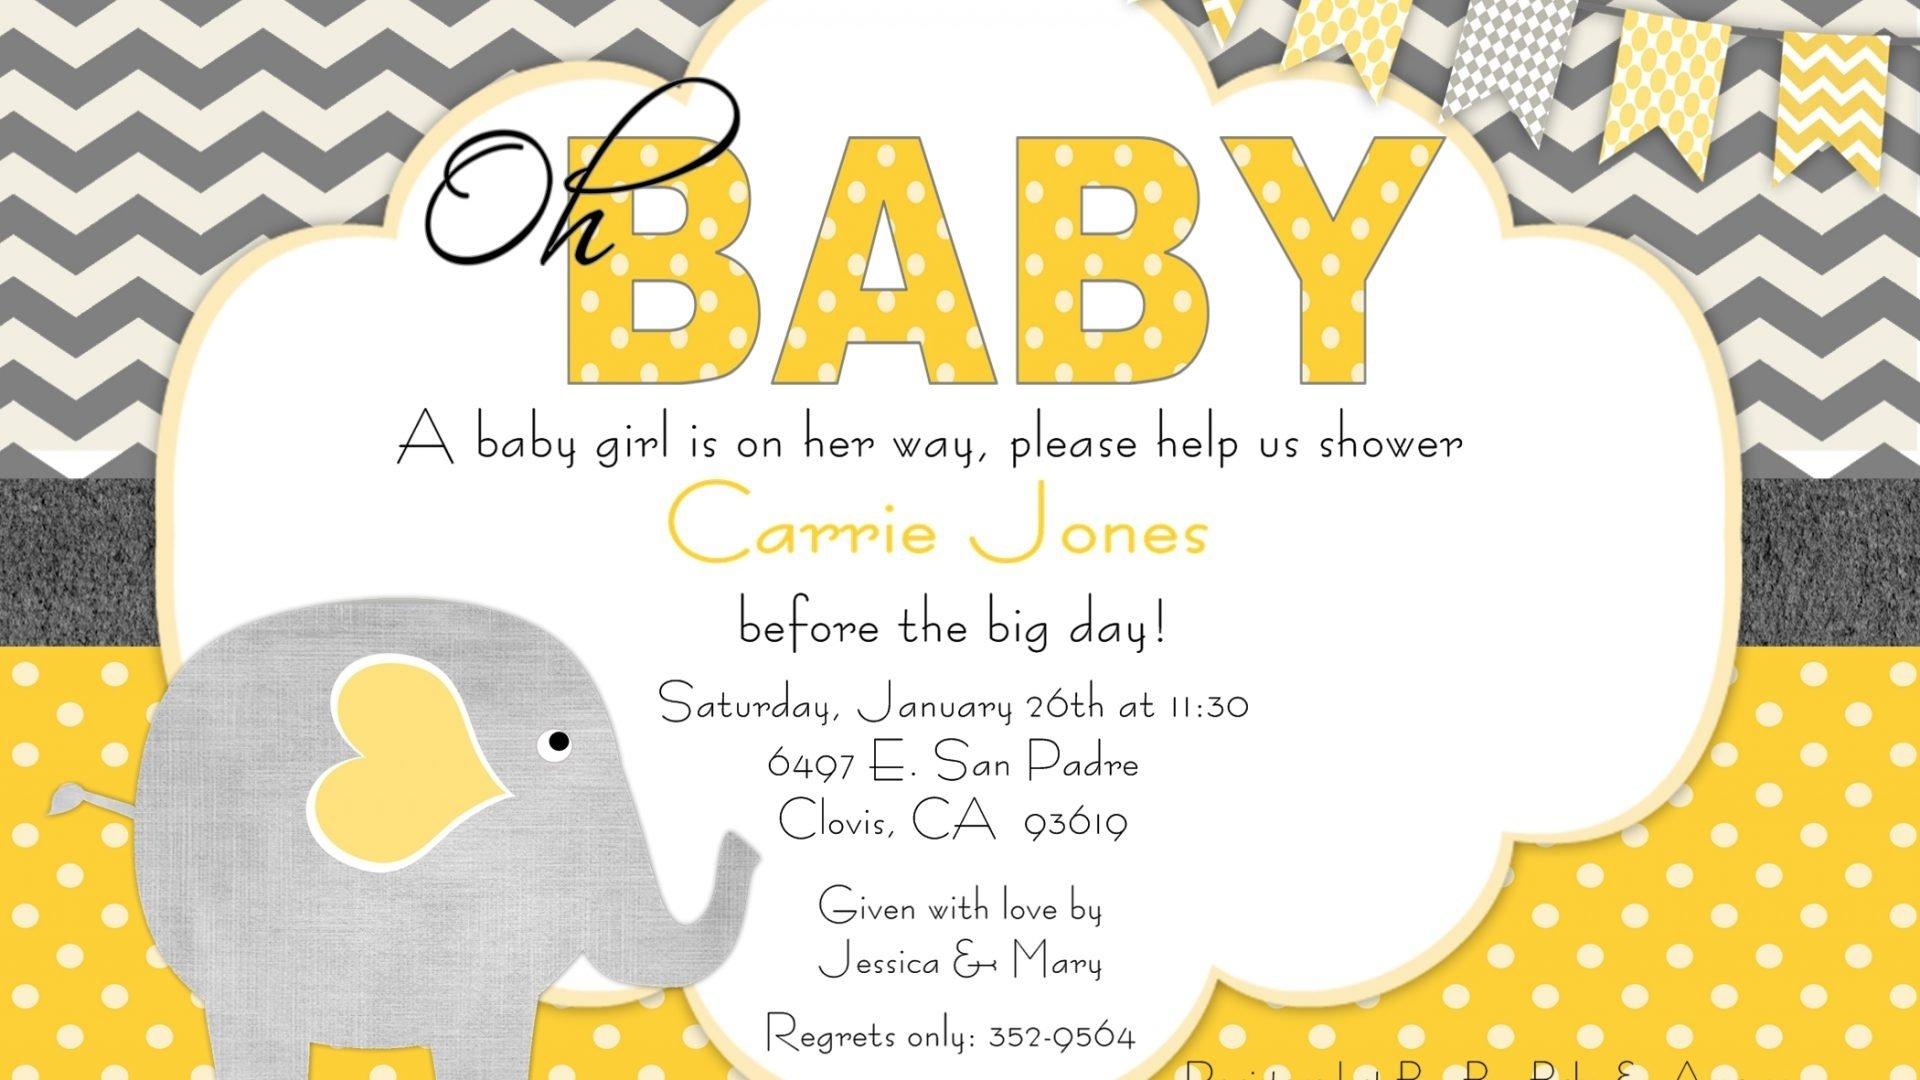 10 Cute Long Distance Baby Shower Ideas long distance babyer invitation poem invitations wording impressive 2020